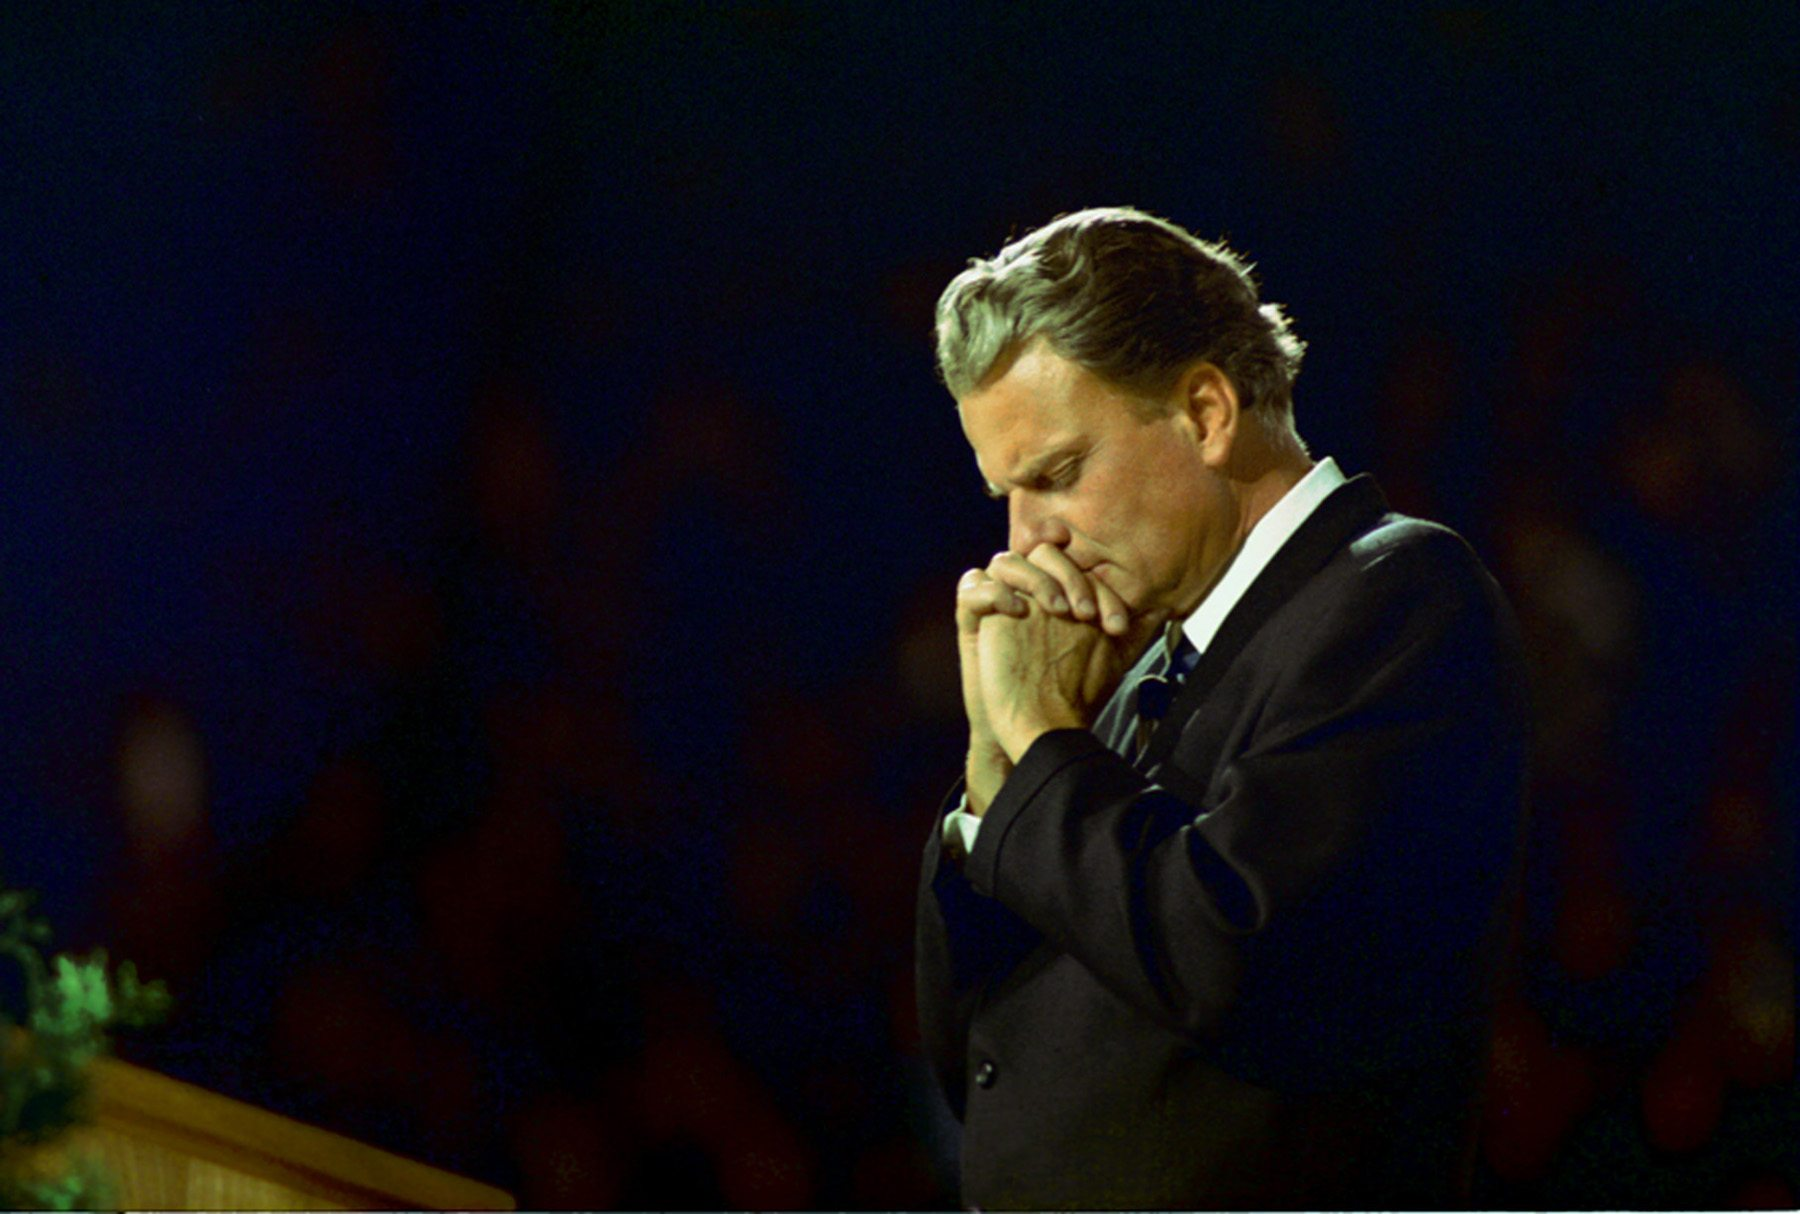 Pastor Robert Jeffress: Billy Graham's Home-Going